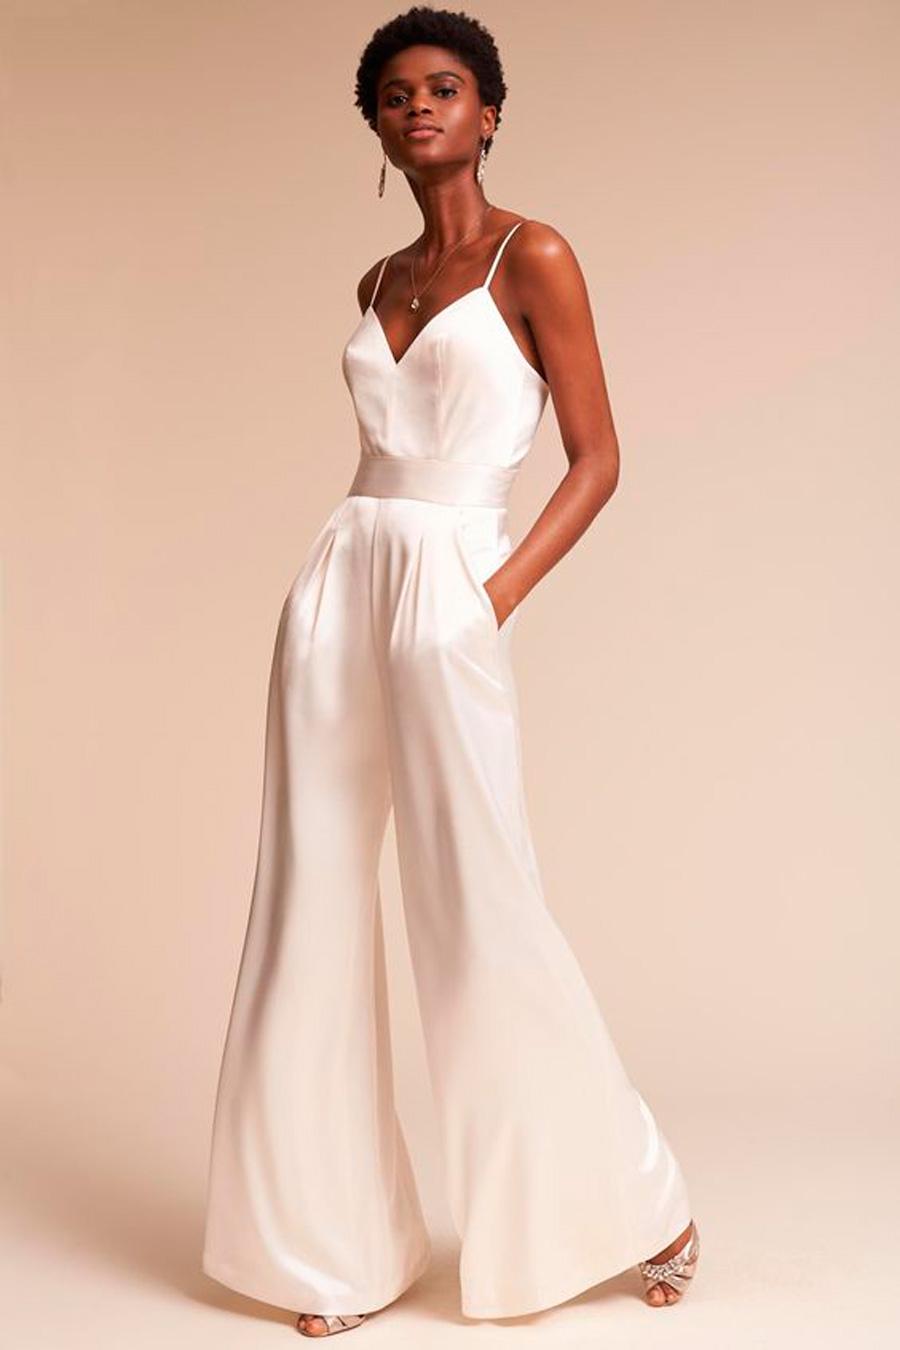 Que significa ver vestidos de novia